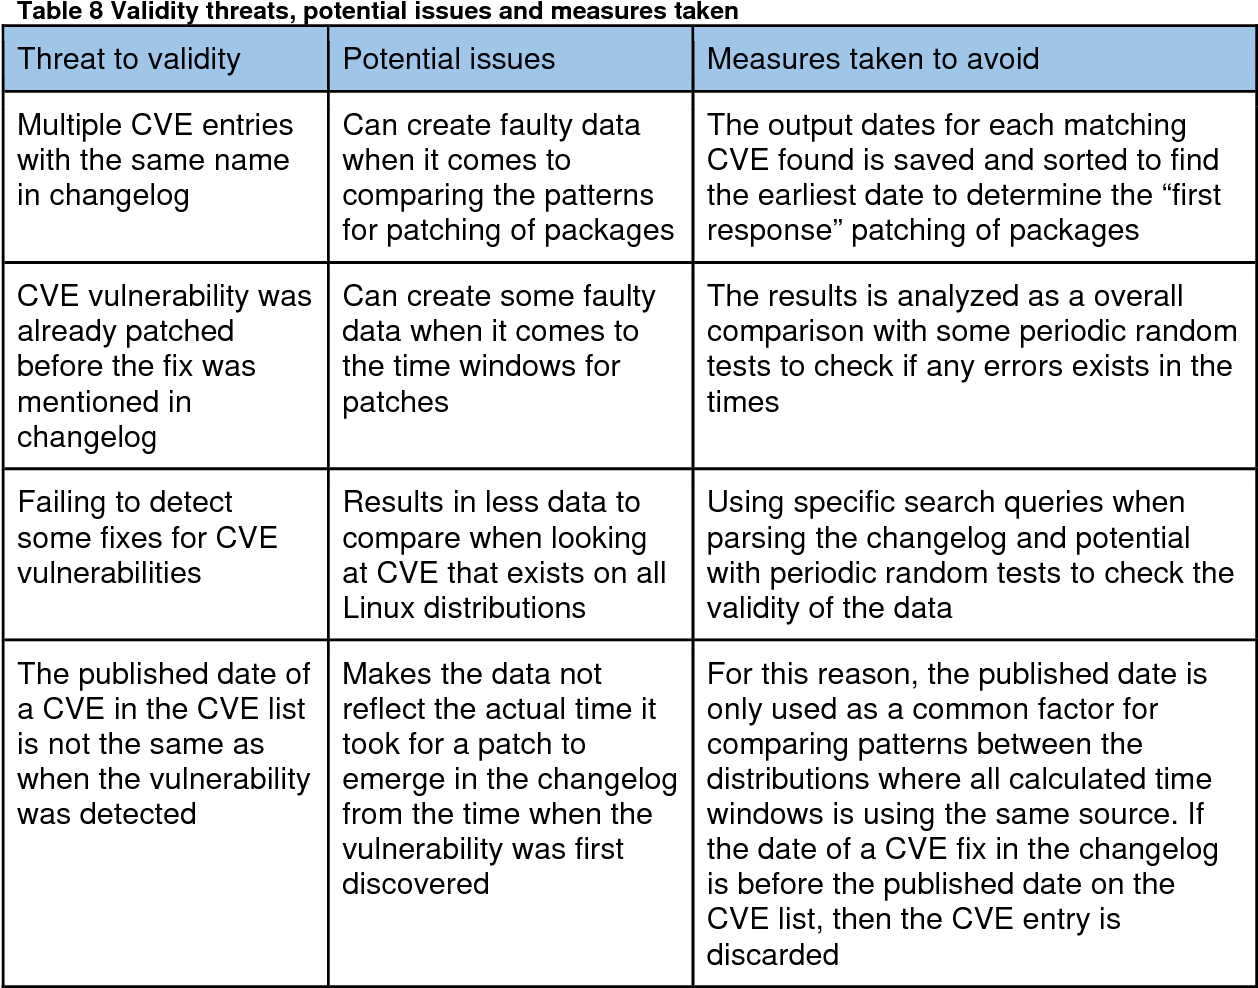 Pdf Ubuntu Debian Fedora Redhat And Opensuse A Comparison In Cve On Linux Distributions Semantic Scholar